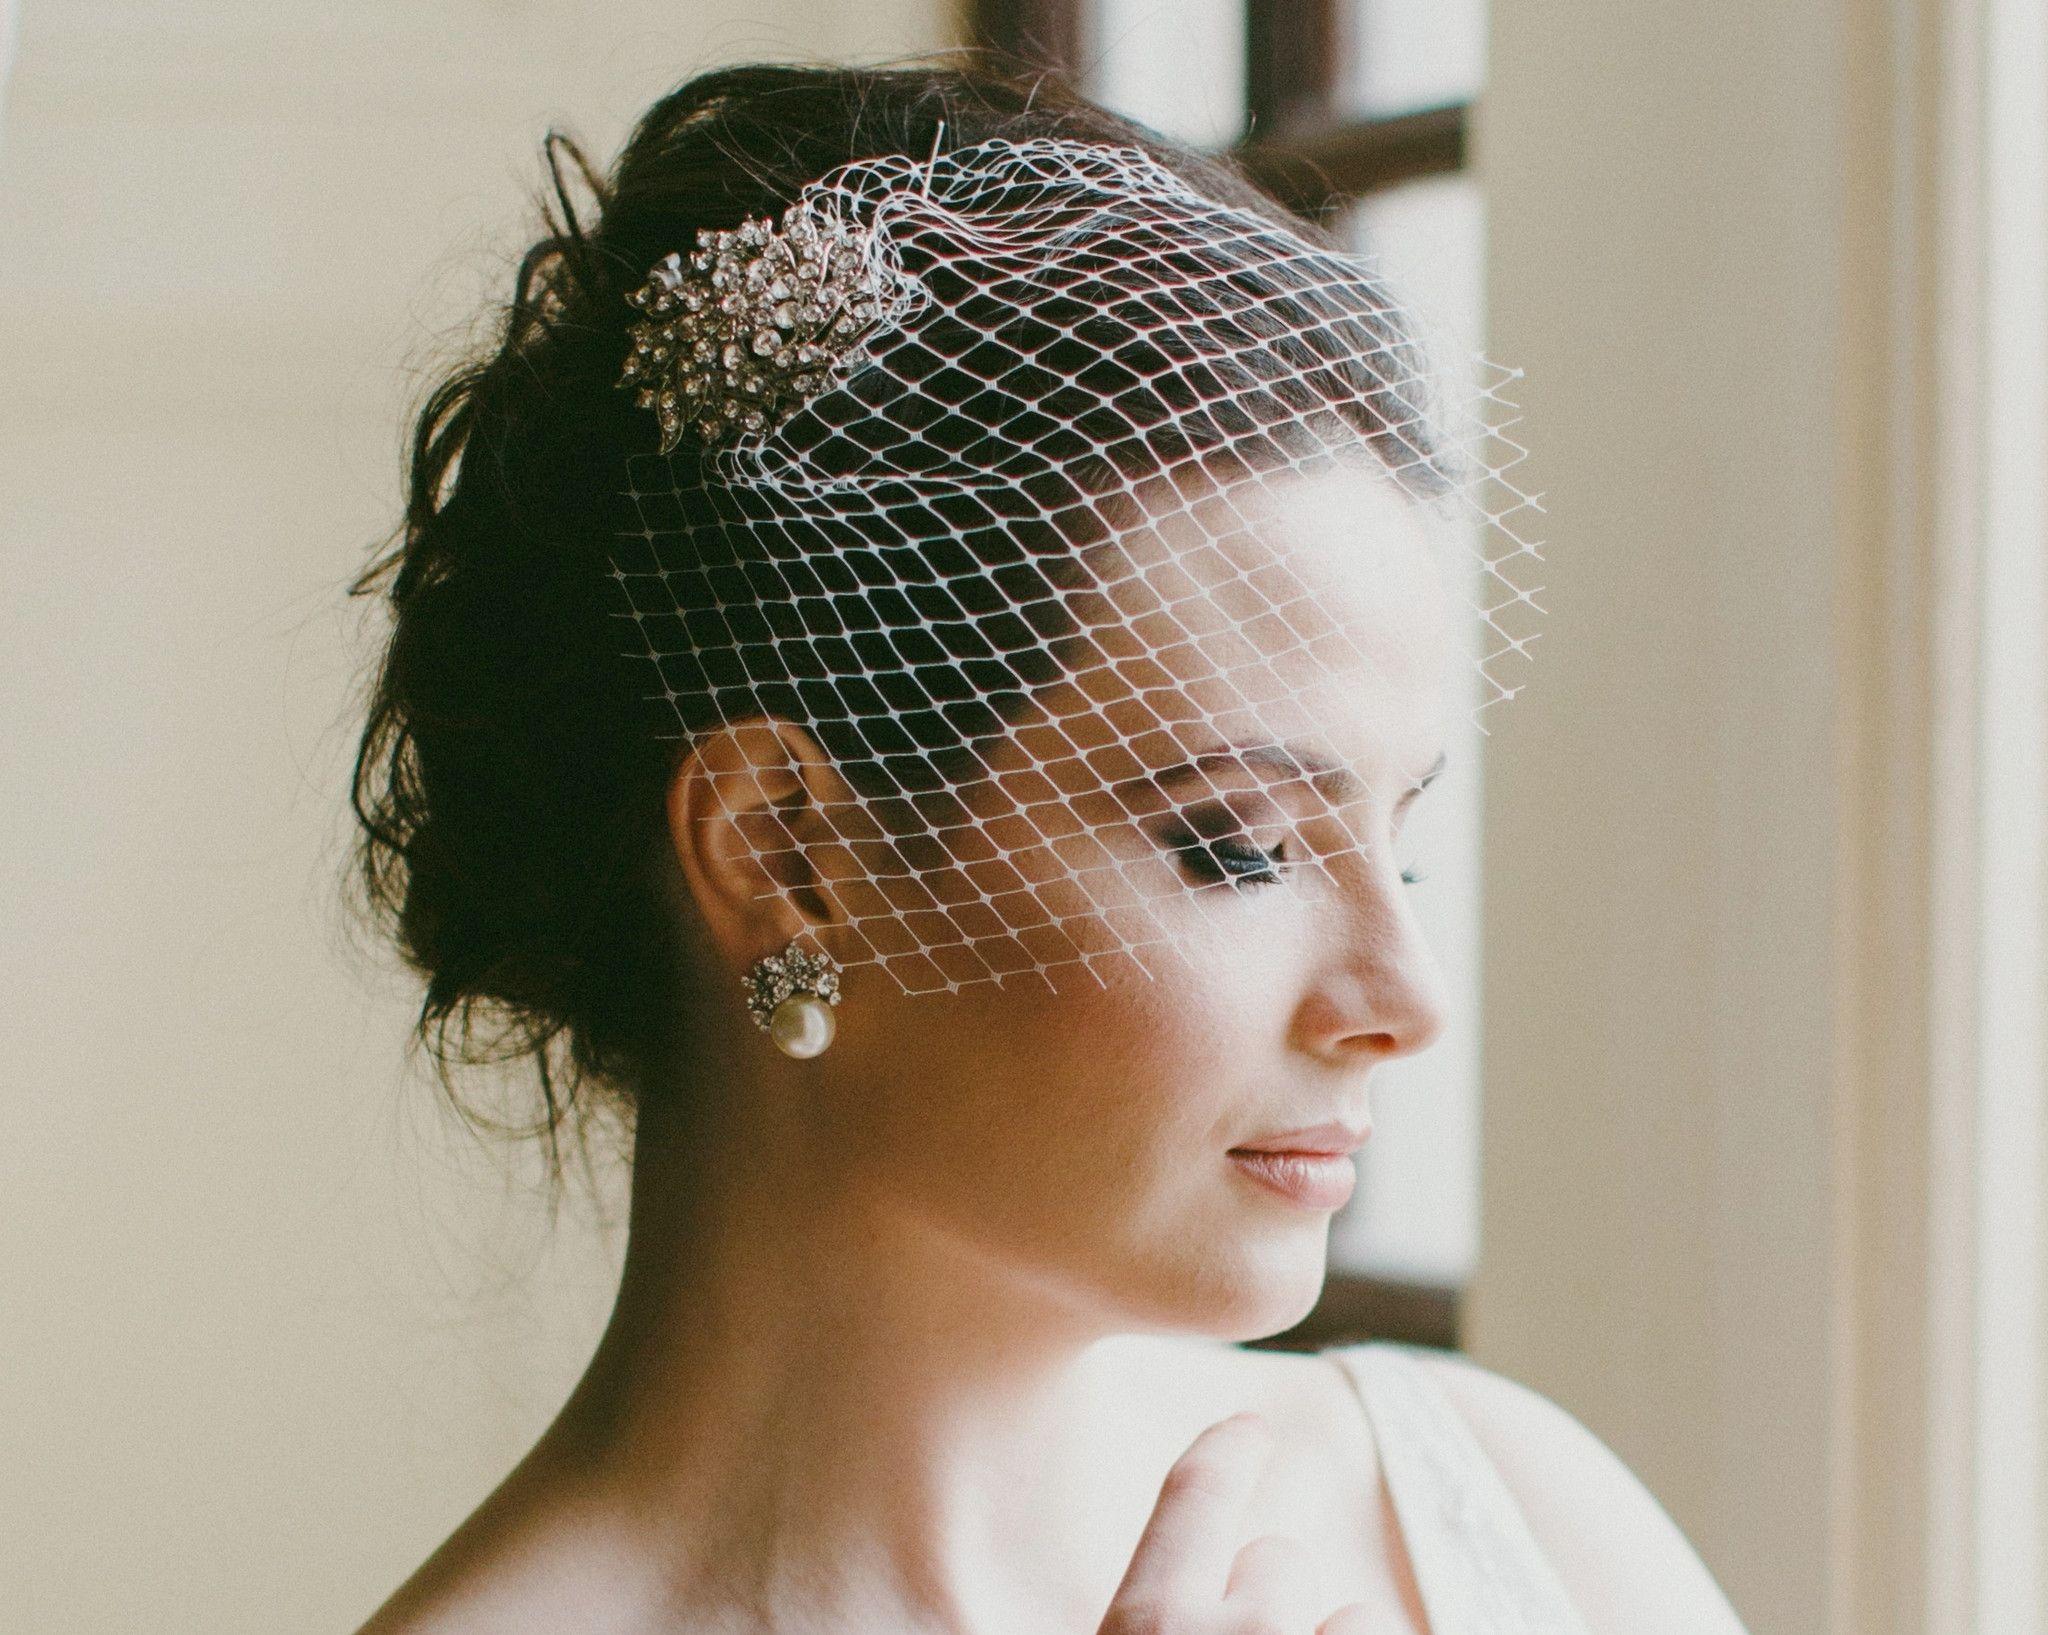 antique style hair clip with birdcage veil, bianca | wedding hair